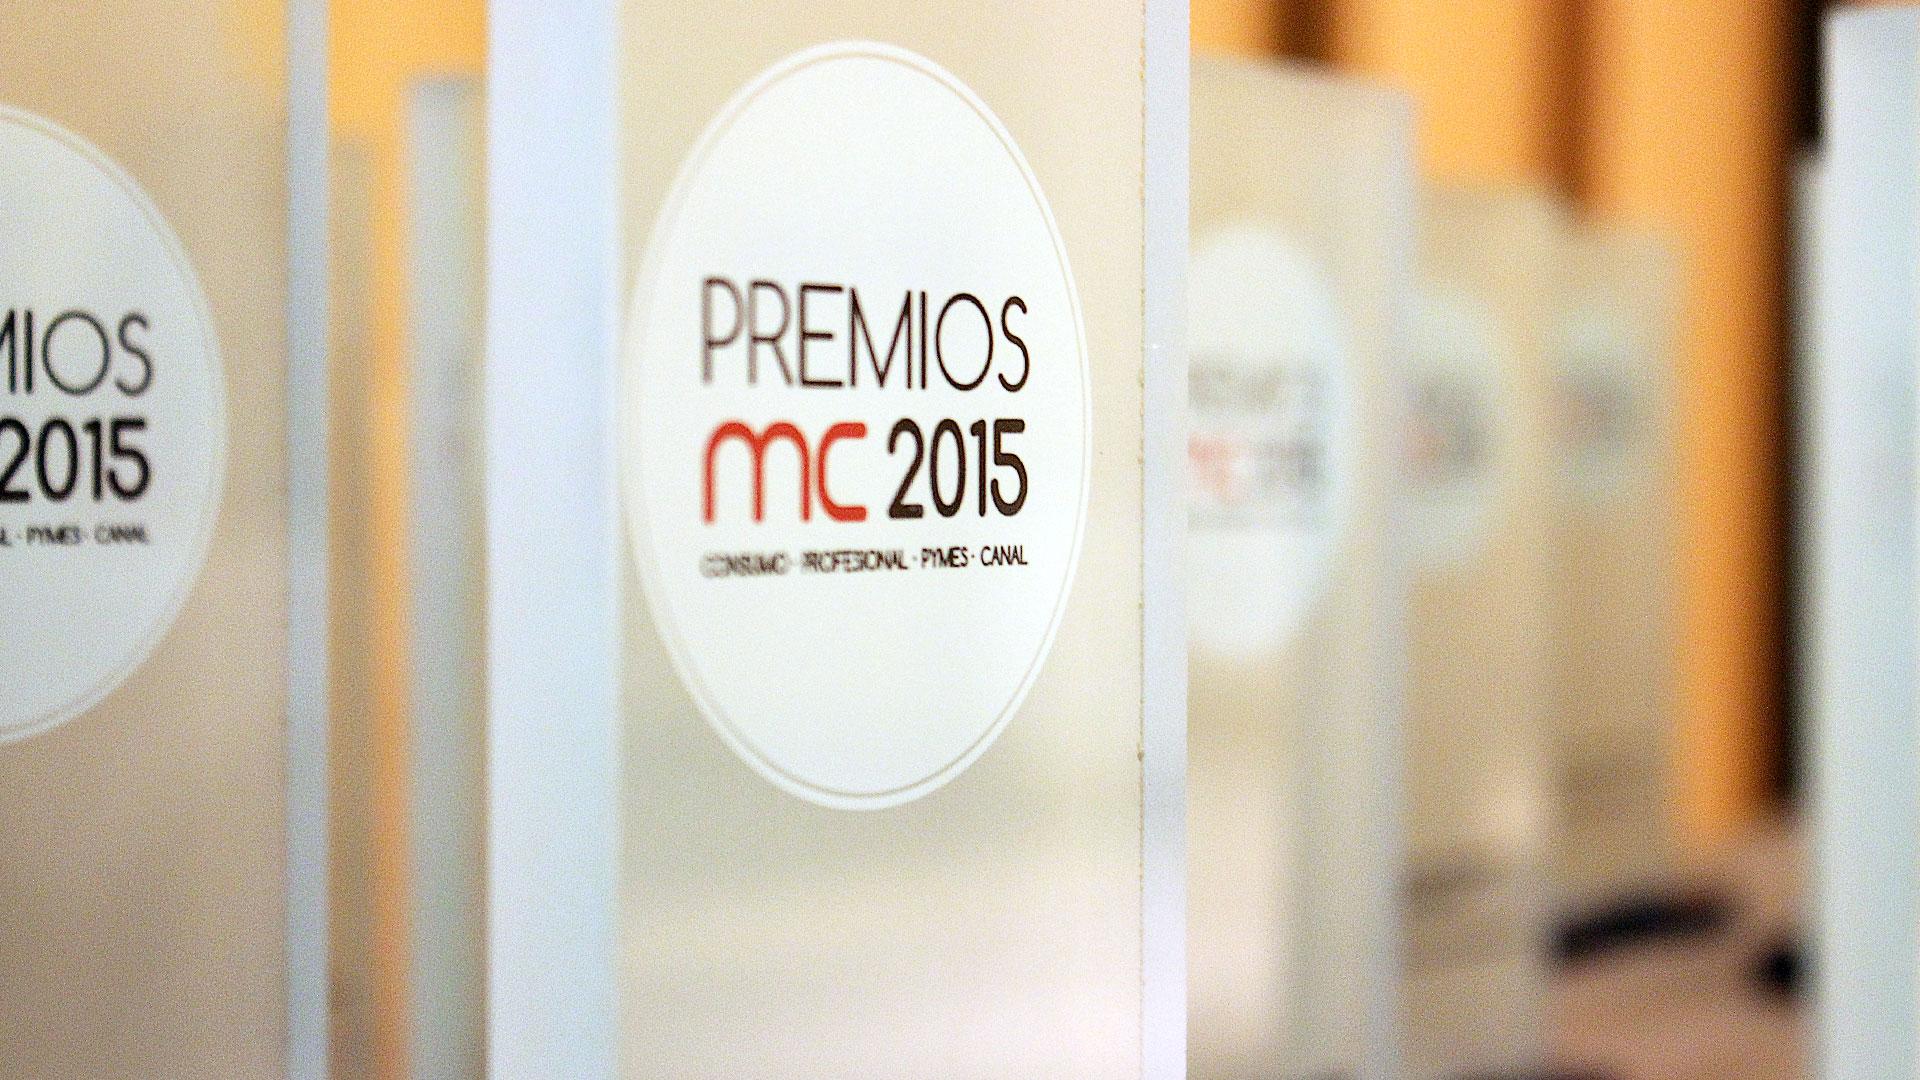 premios-mc2015-evento-comida-hotel-hesperia-trofeo-detalle-lateral